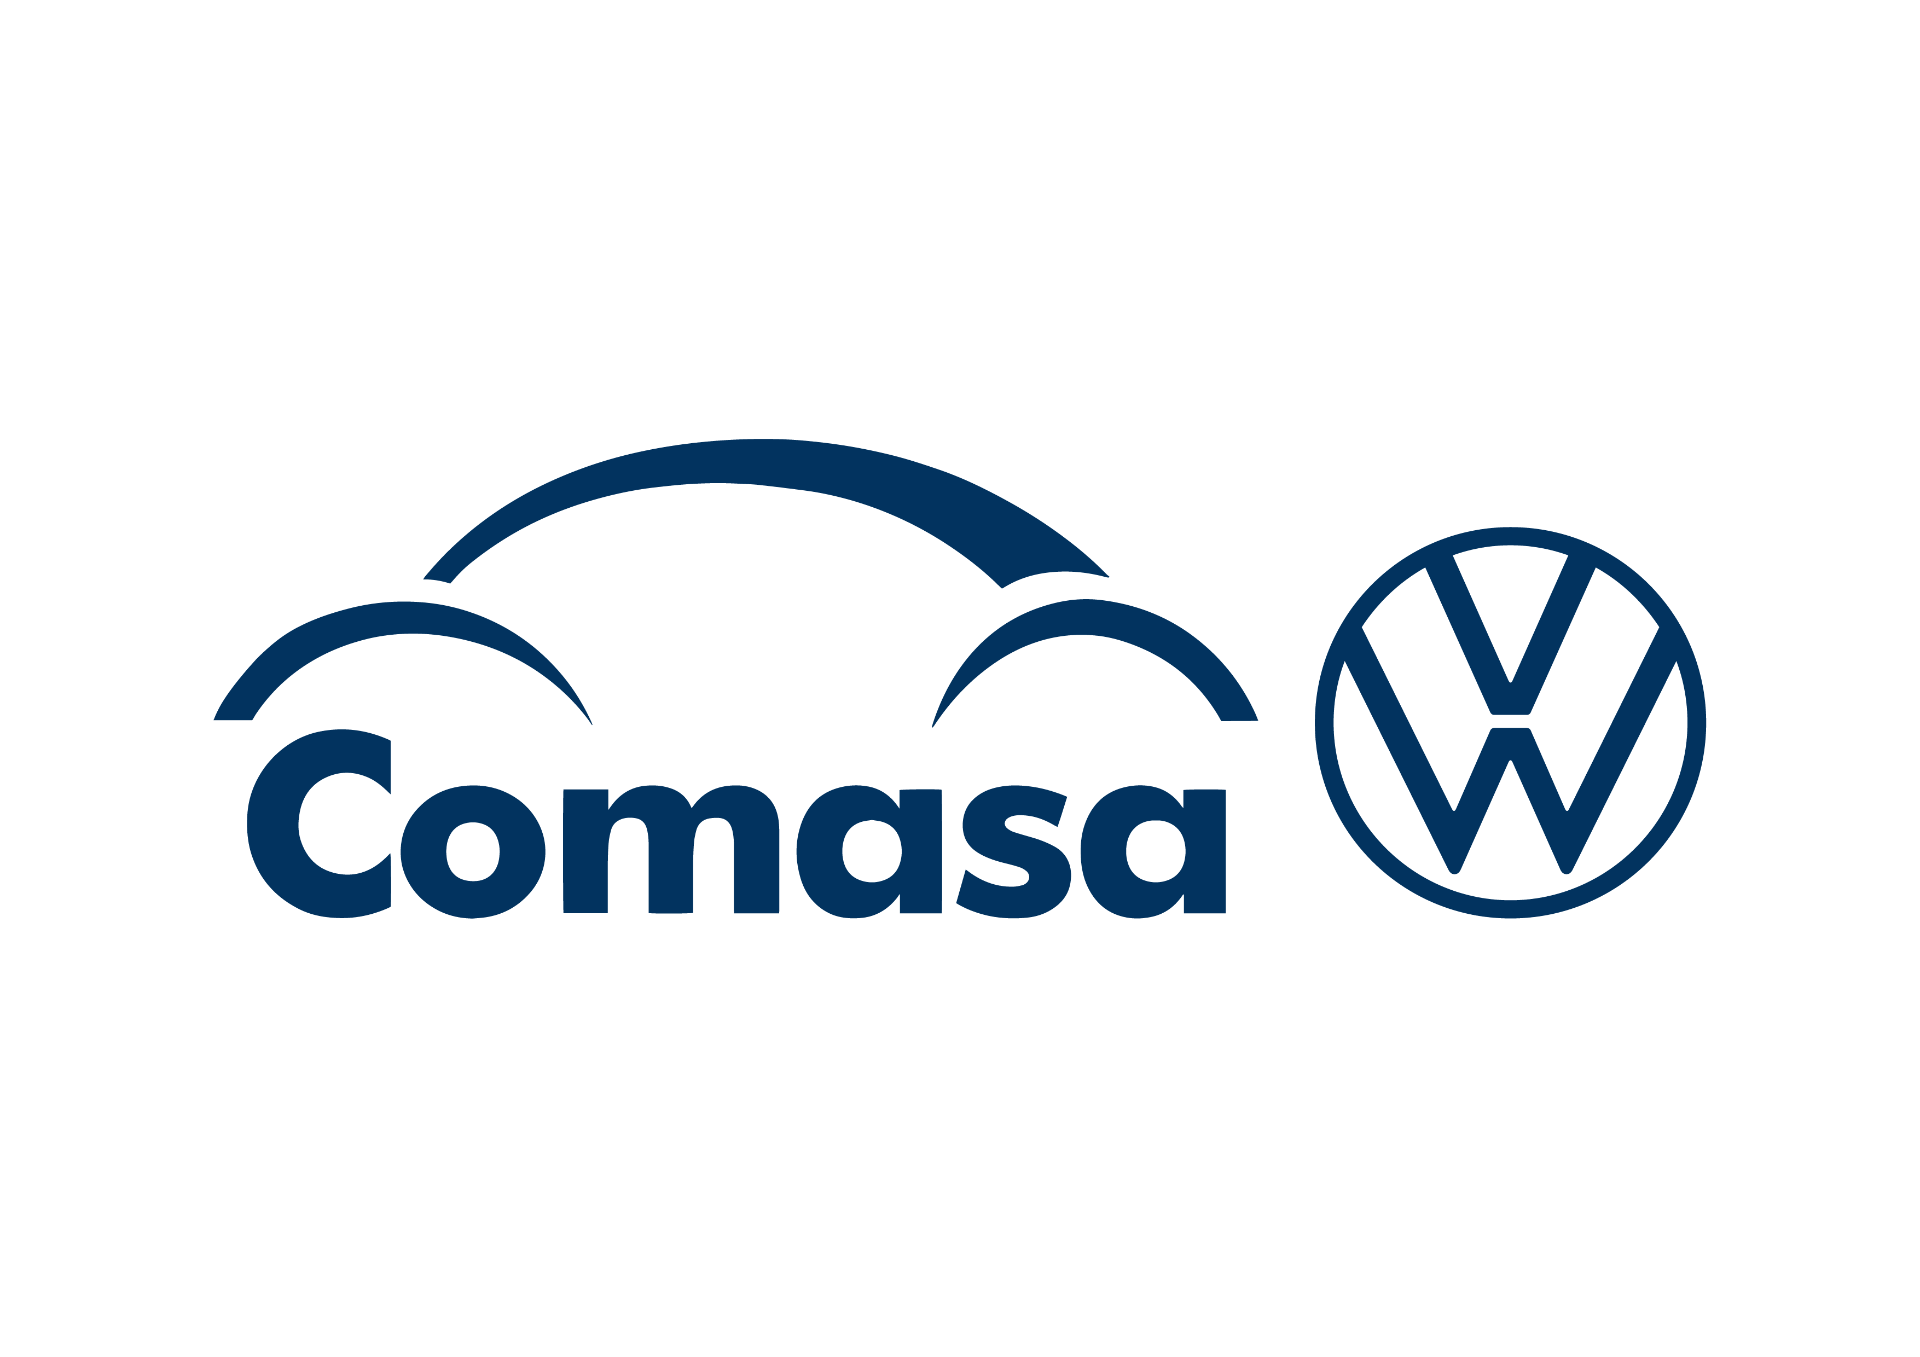 Comasa Volkswagen